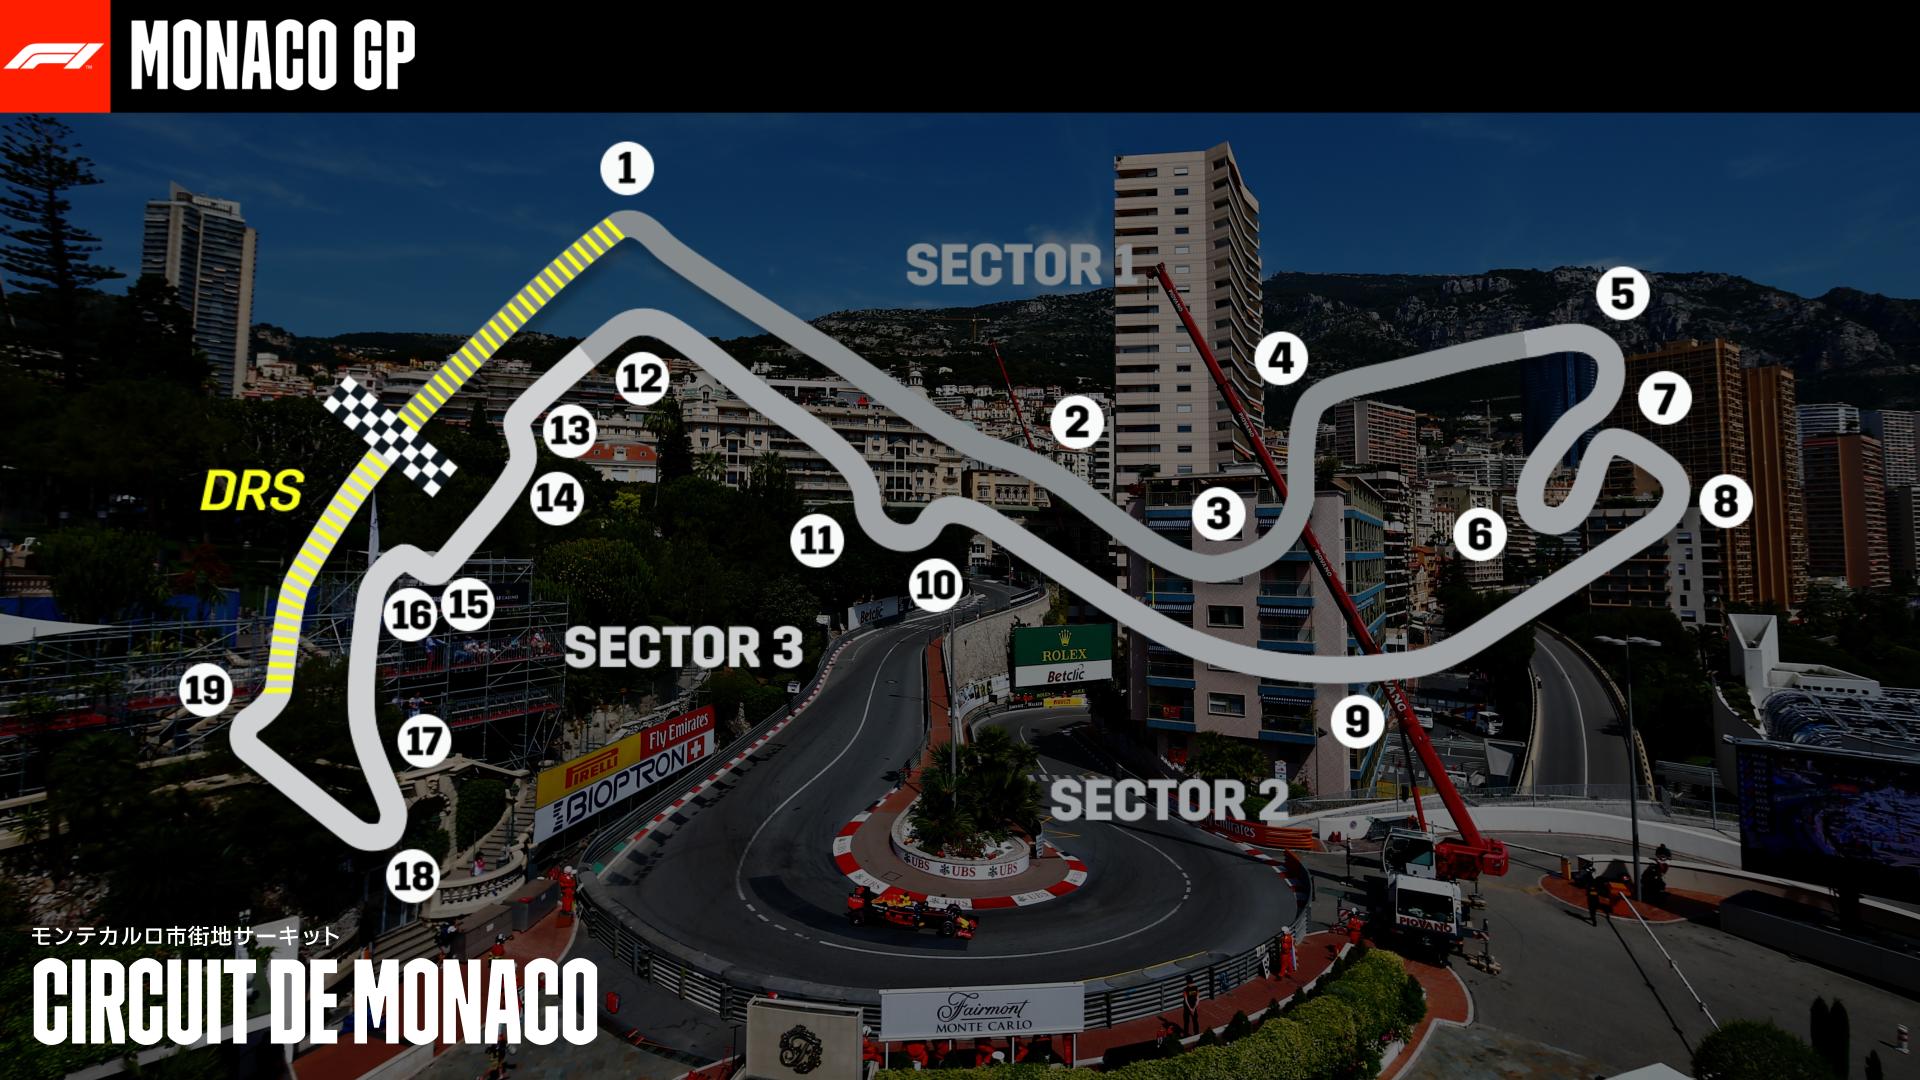 2021-05-12 Monaco Circuit F1 Formula 1